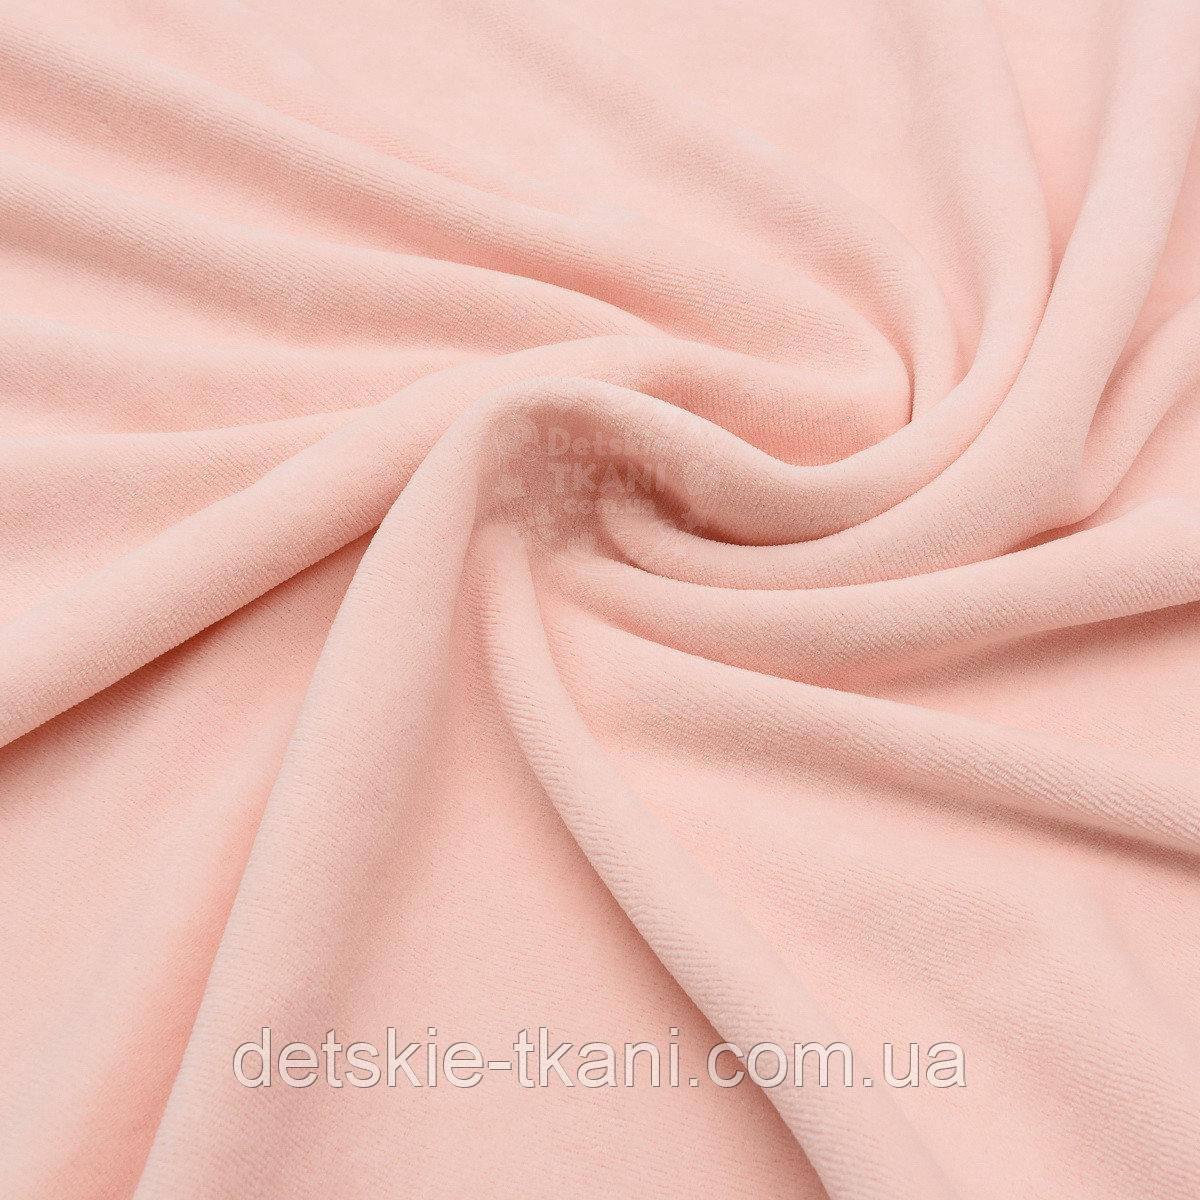 Лоскут однотонного  ХБ велюра бледно-розового цвета, размер 30*170 см